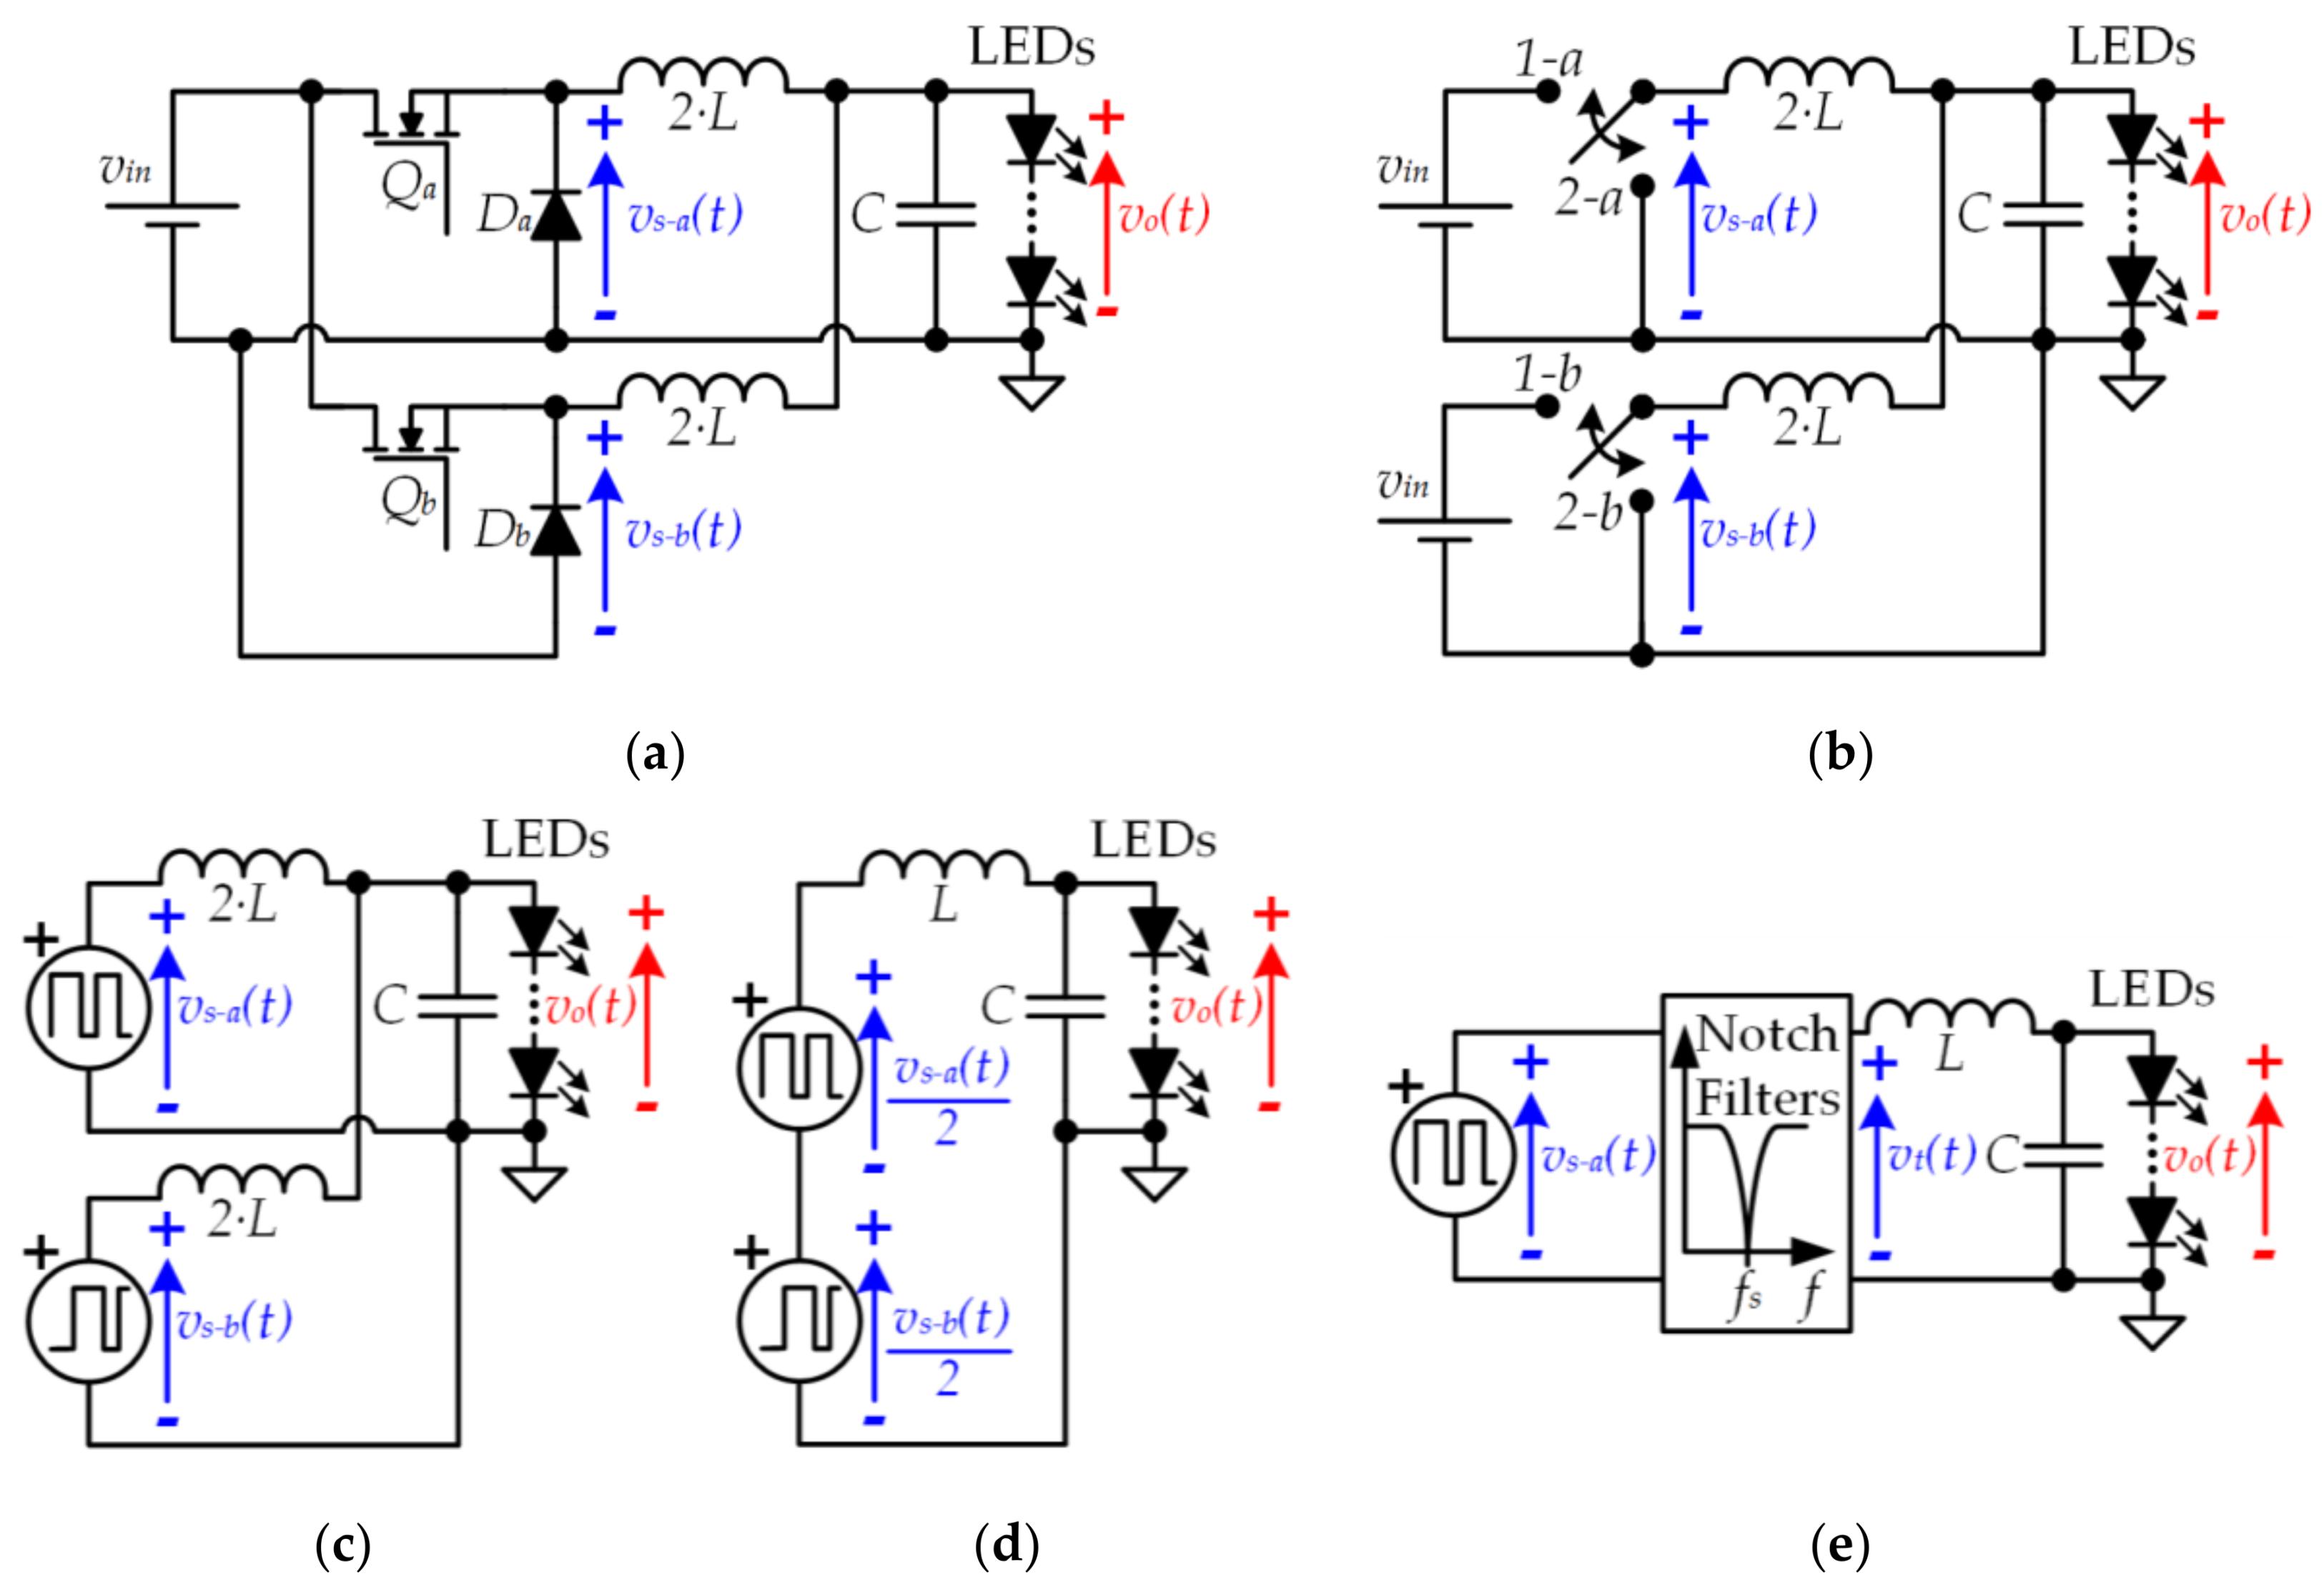 Sensors Free Full Text Efficient Visible Light Communication Simple Pulse Position Modulation Circuit 18 01127 G013